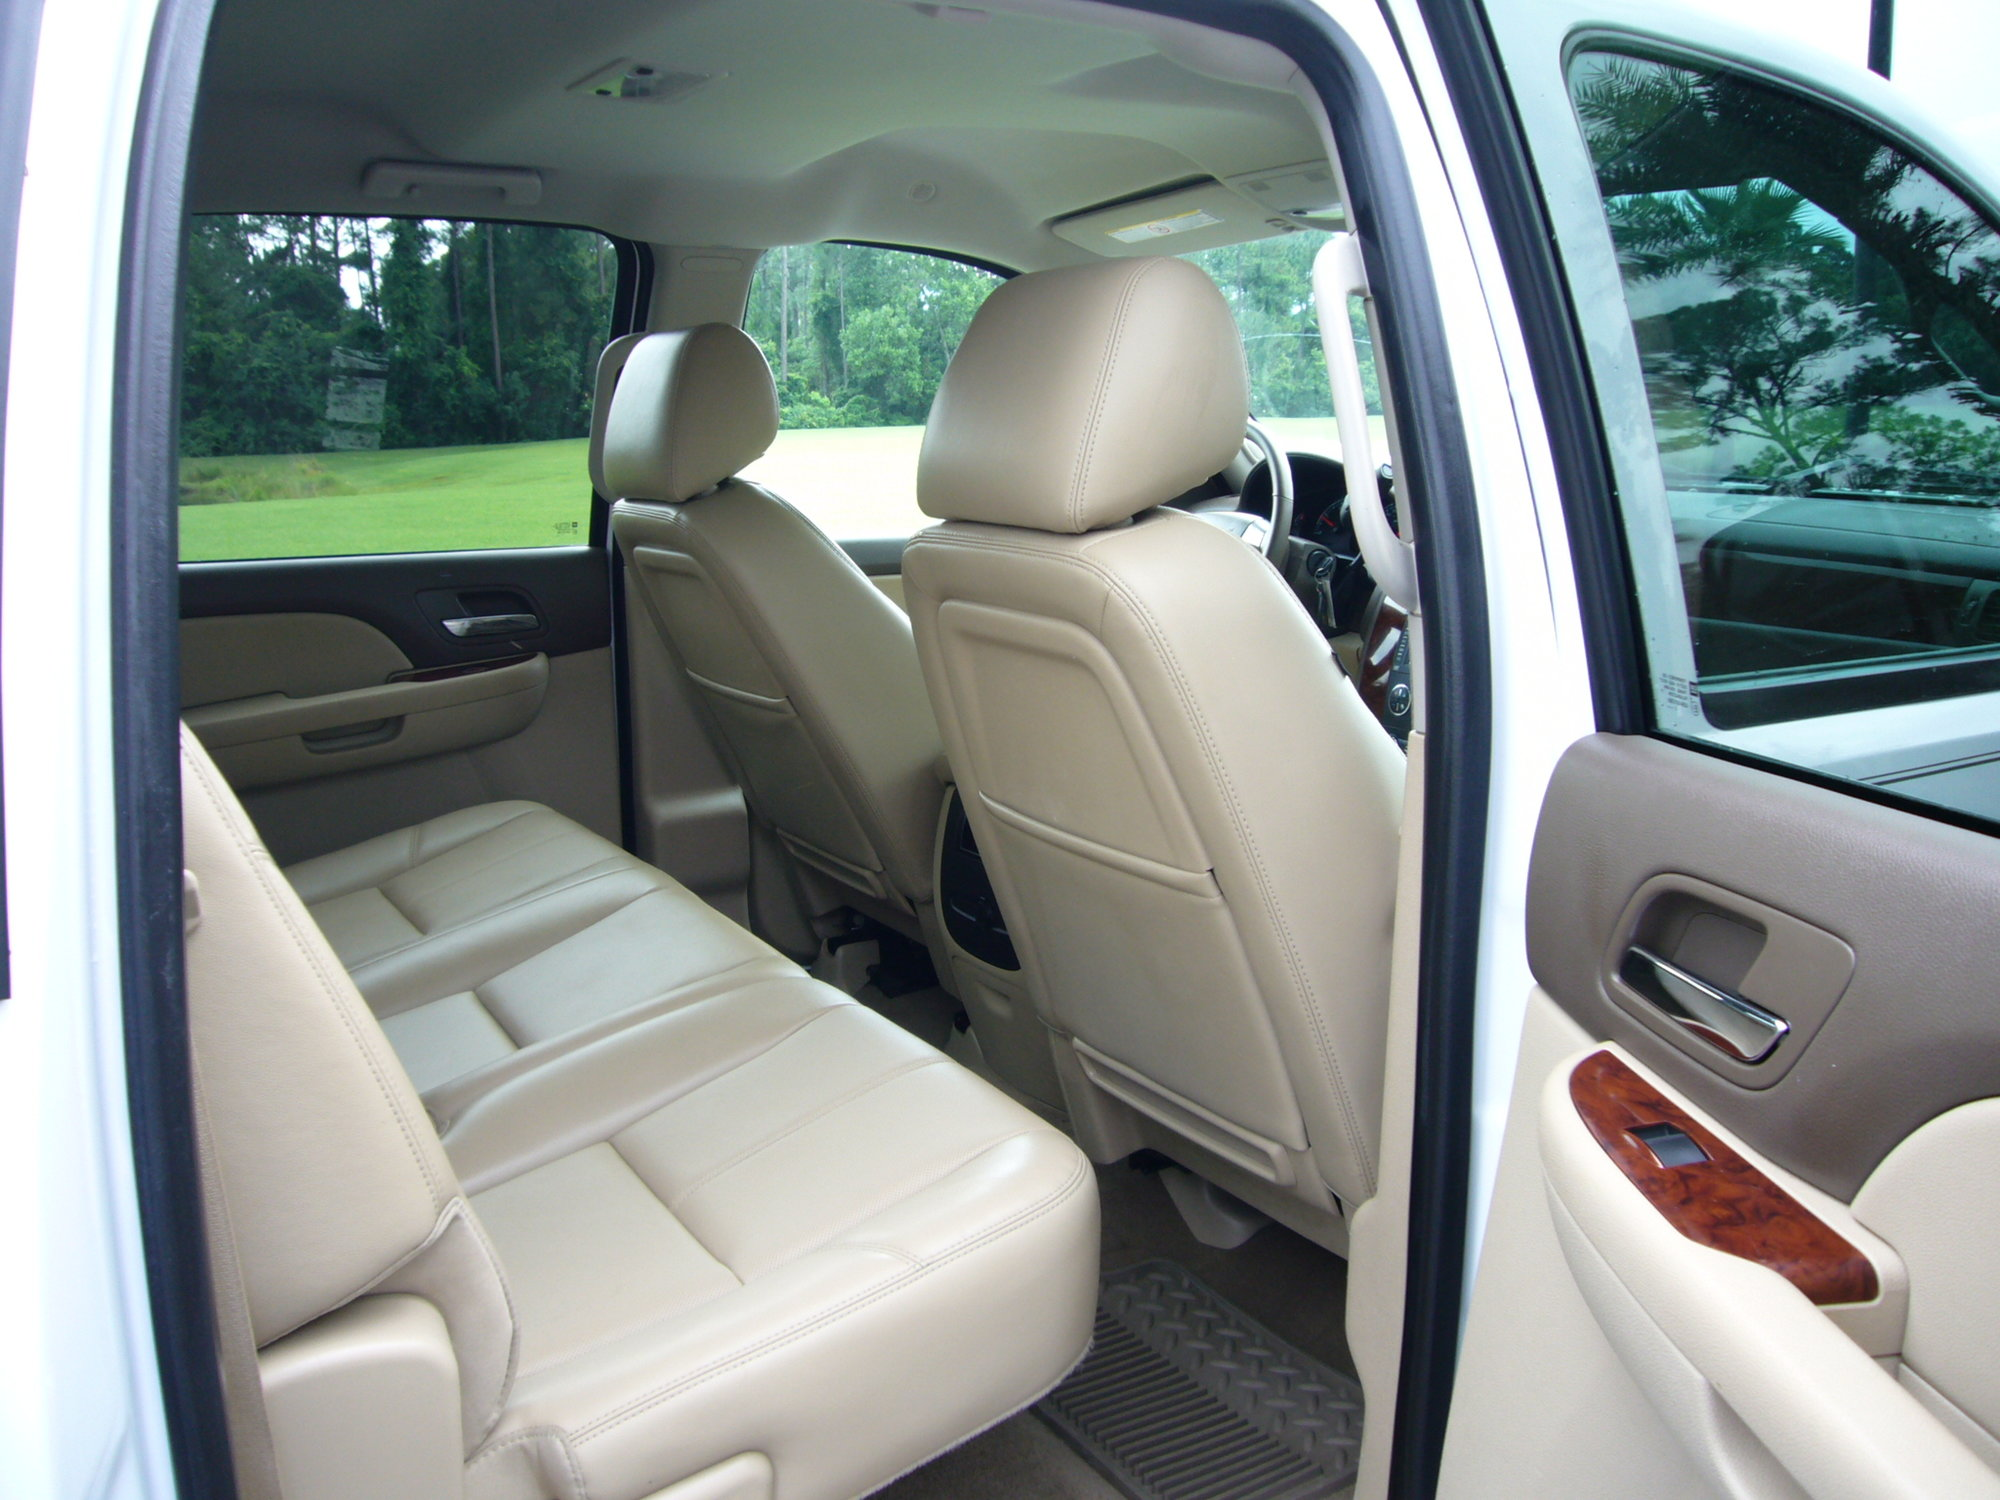 2014 Chevy Silverado Crew Cab LTZ 2500HD Duramax Diesel ...